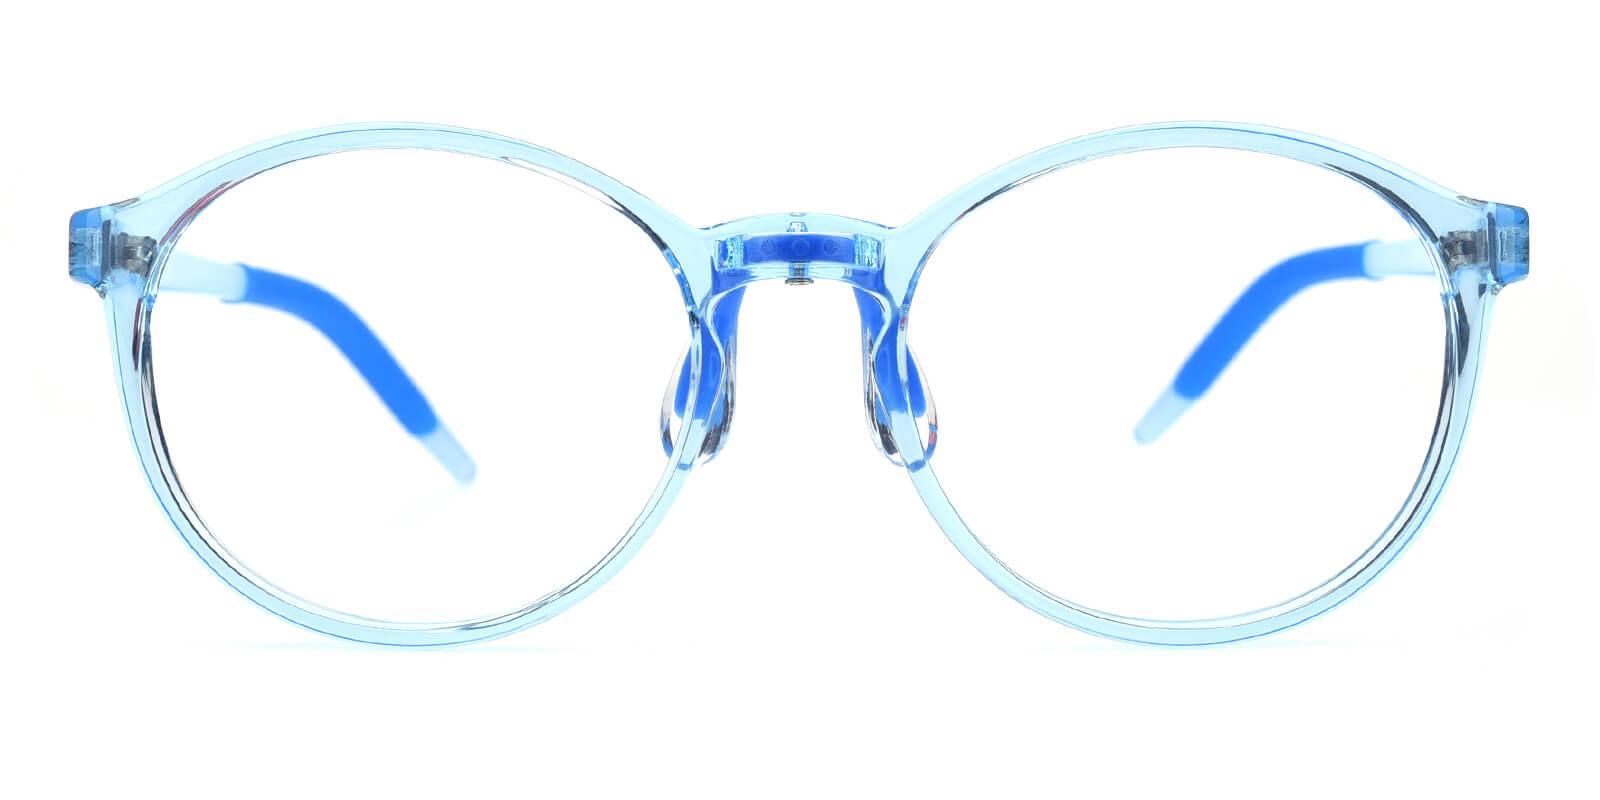 Chigor-Translucent-Round-TR-Eyeglasses-additional2